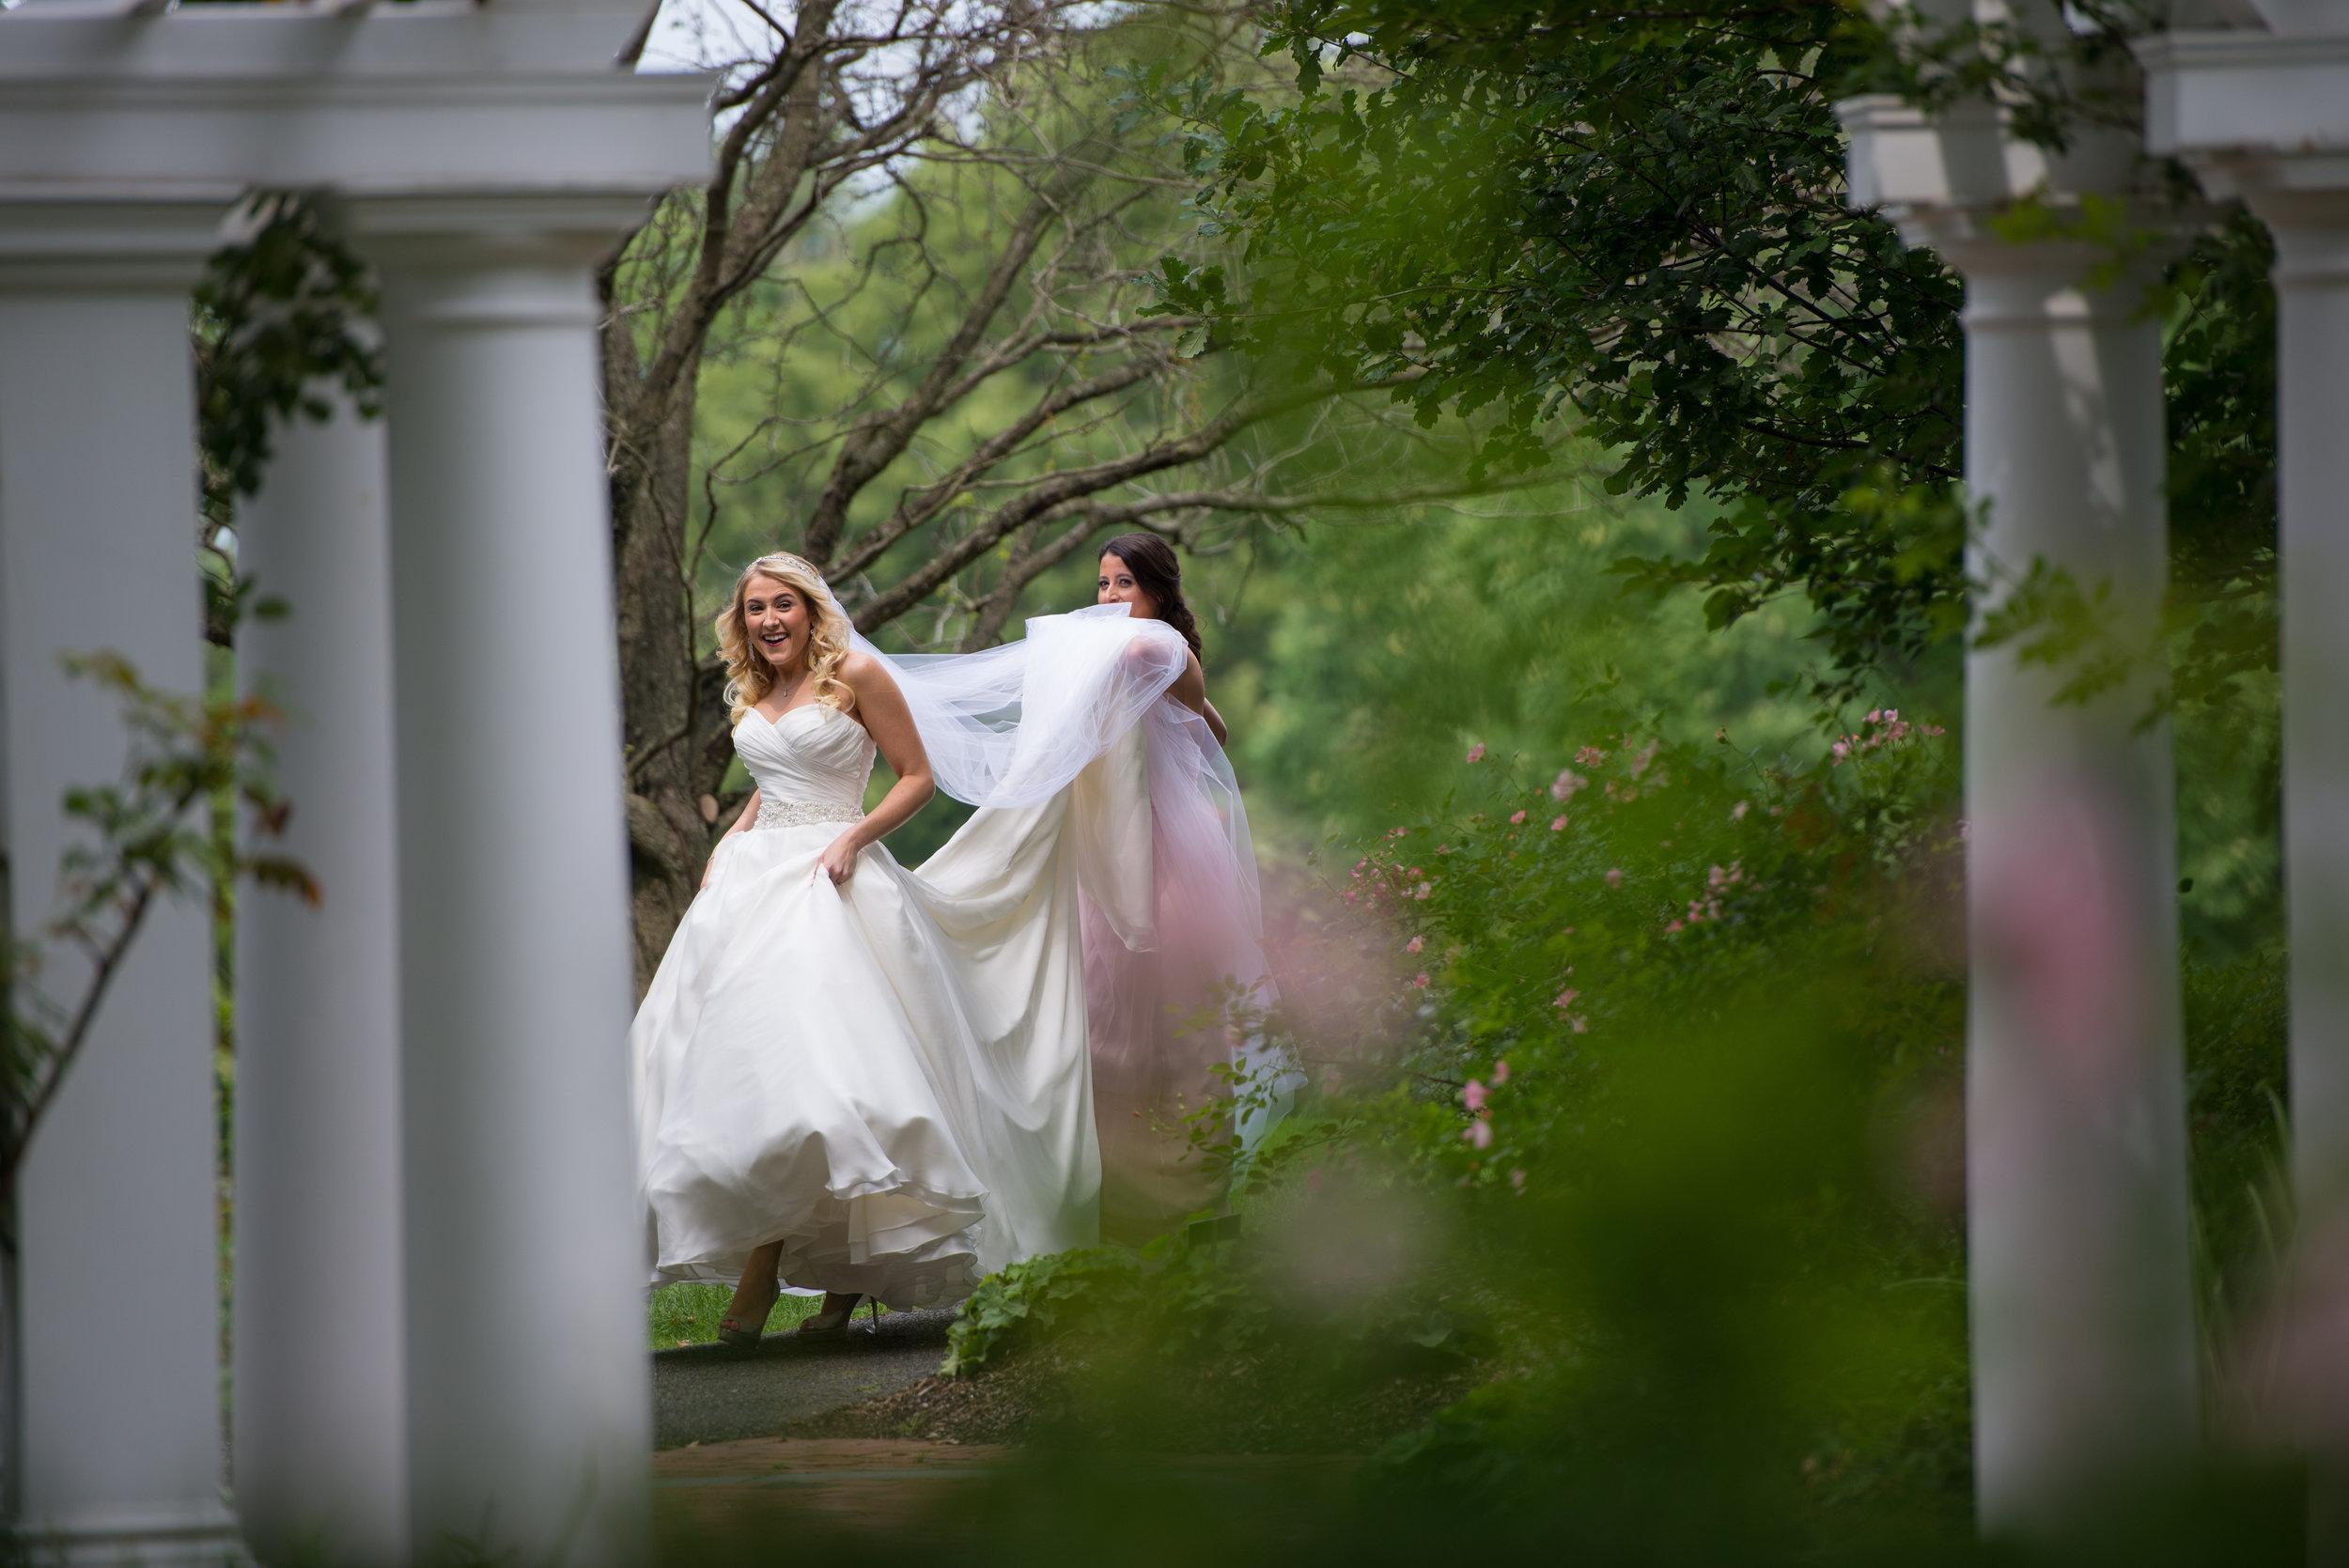 Wedding First Look Photos00902.jpg